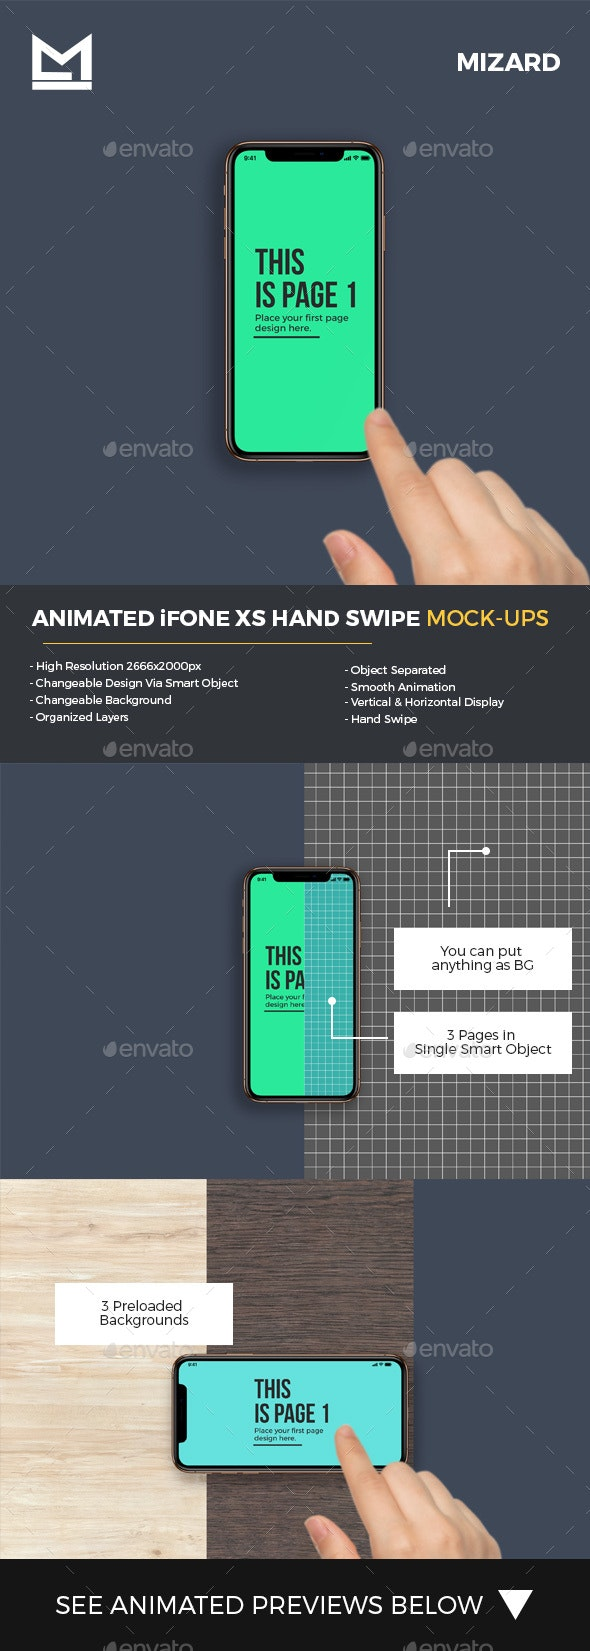 Animated iFone XS Hand Swipe Mockup - Mobile Displays